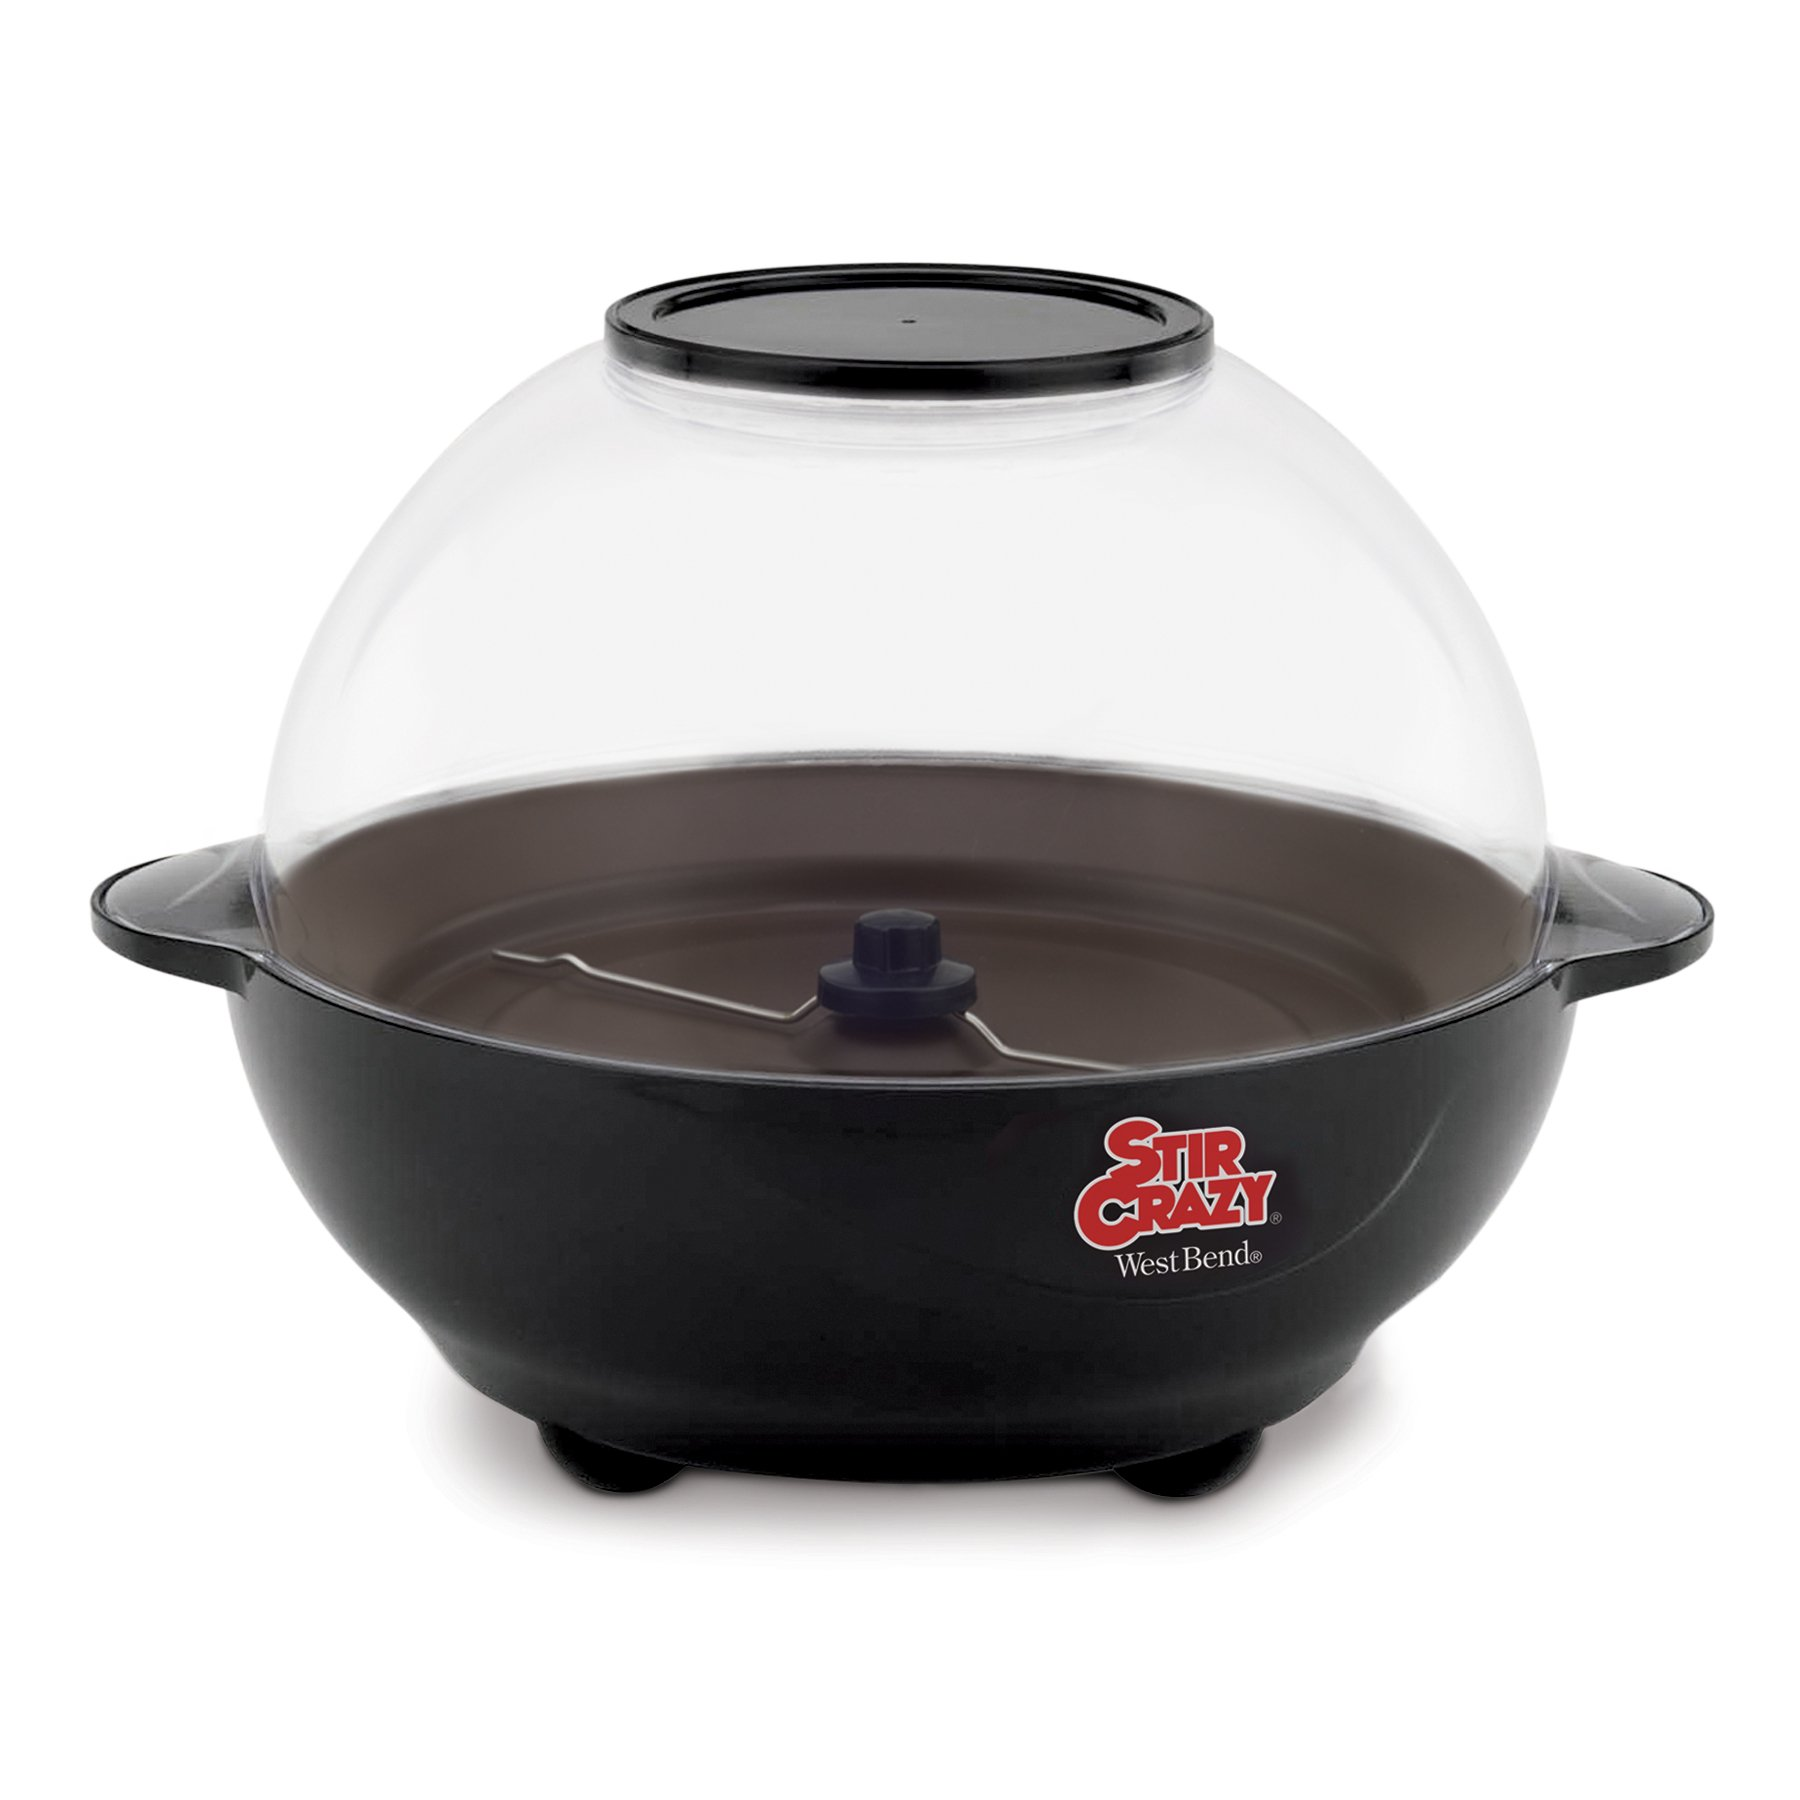 West Bend 82306 Stir Crazy 6-Quart Electric Popcorn Popper (Discontinued by Manufacturer)